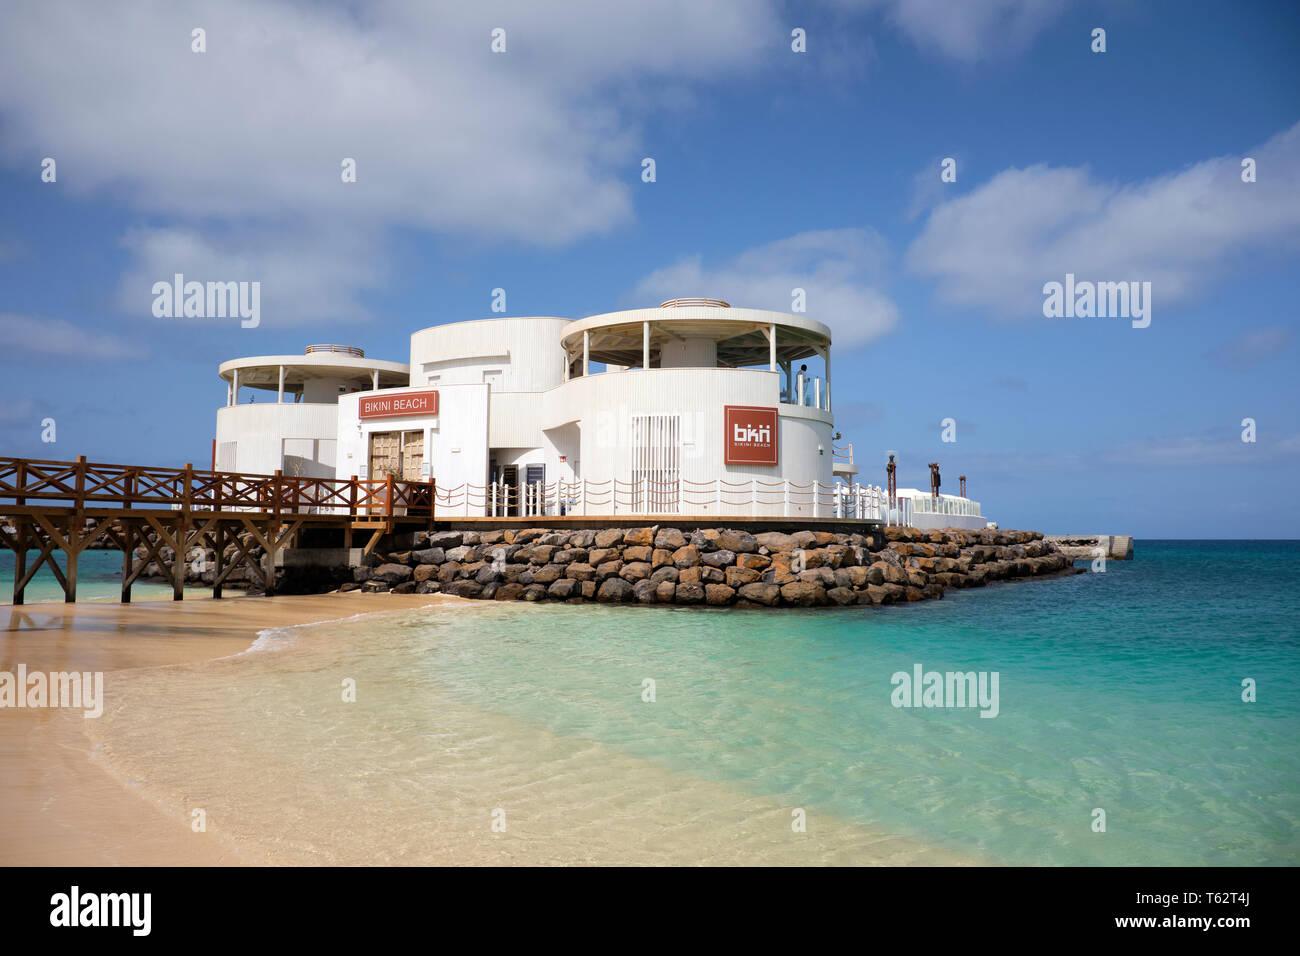 IslandCape MariaSal Bikini Beach Stock ClubSanta VerdeAfrica kXnPO80w